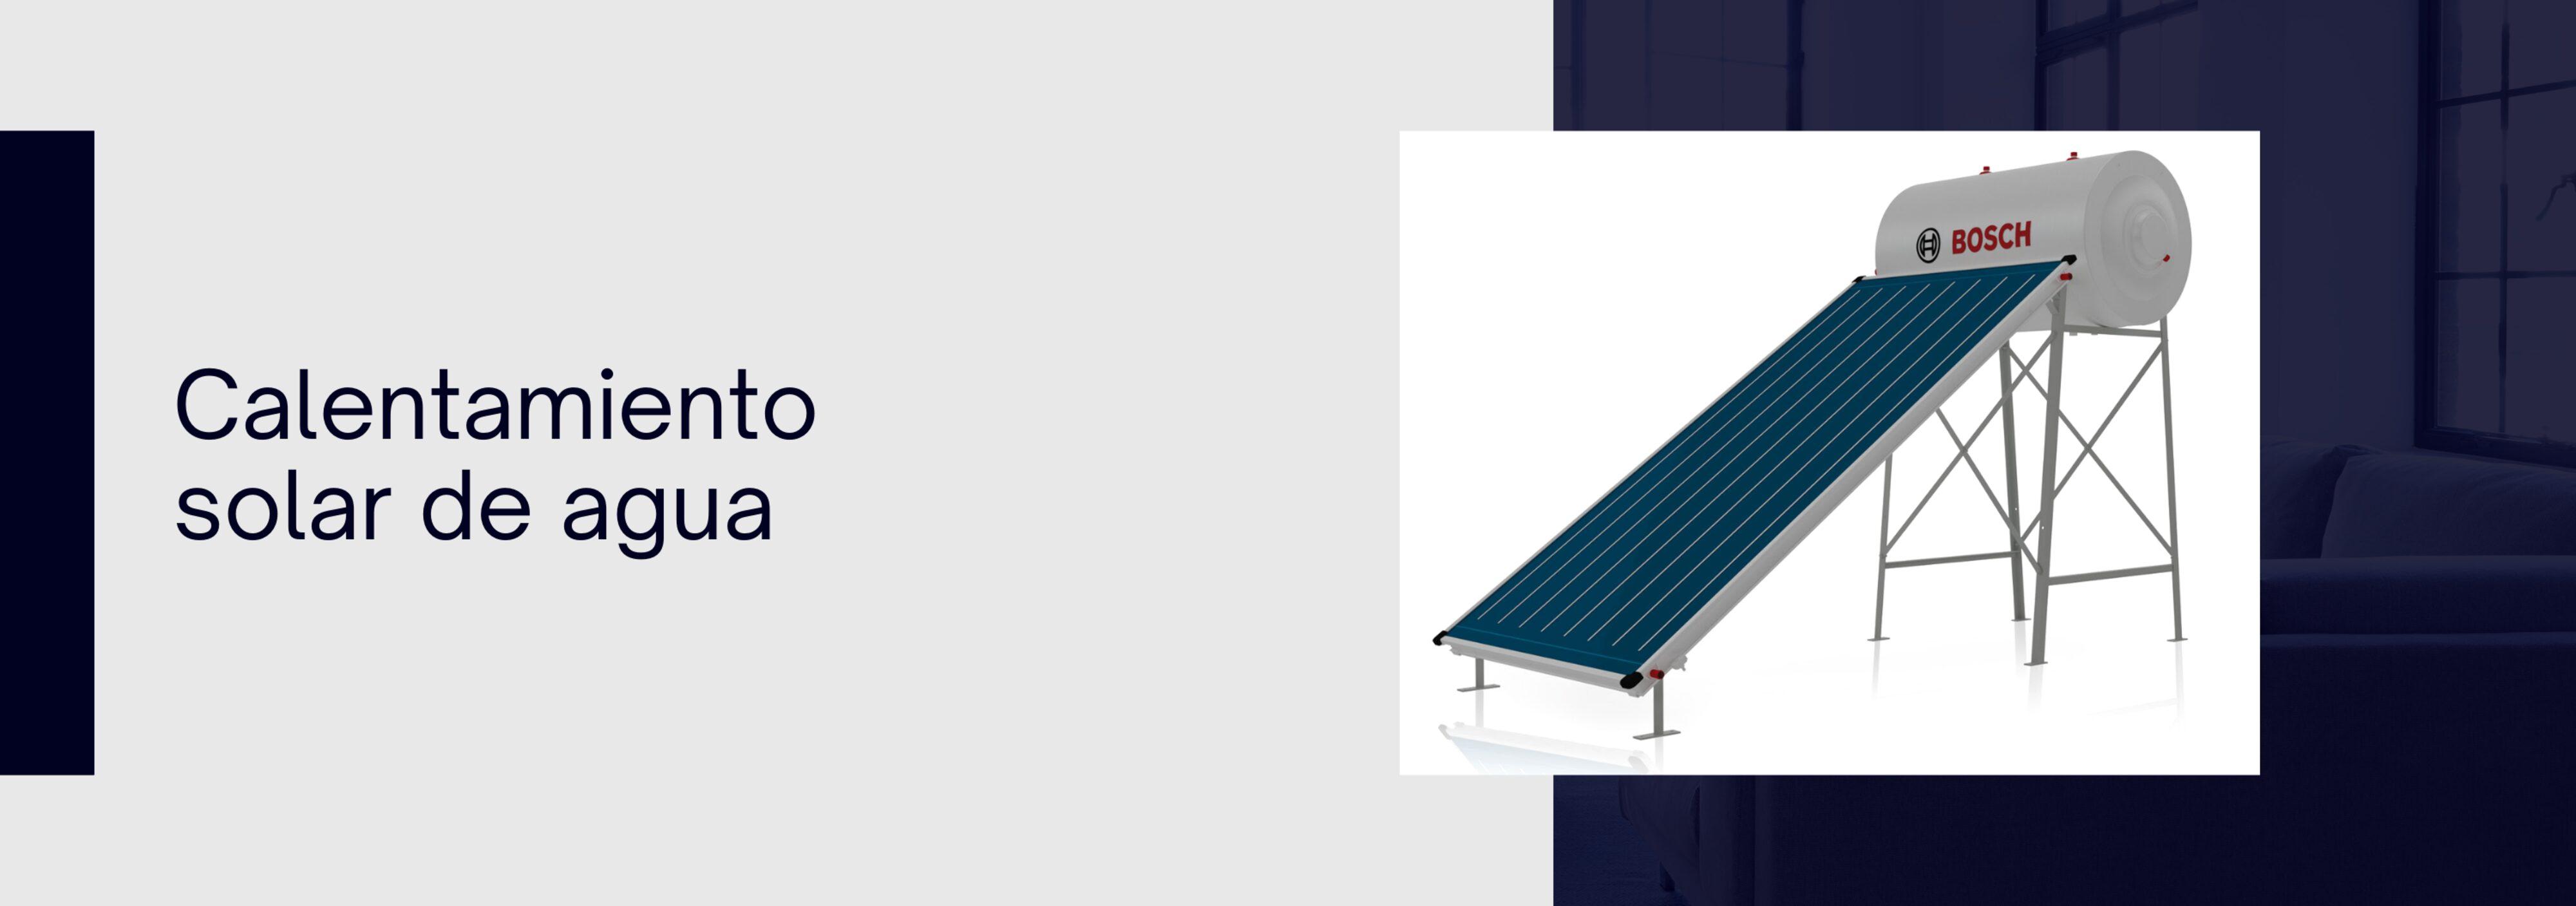 Slider Calentamiento solar de agua